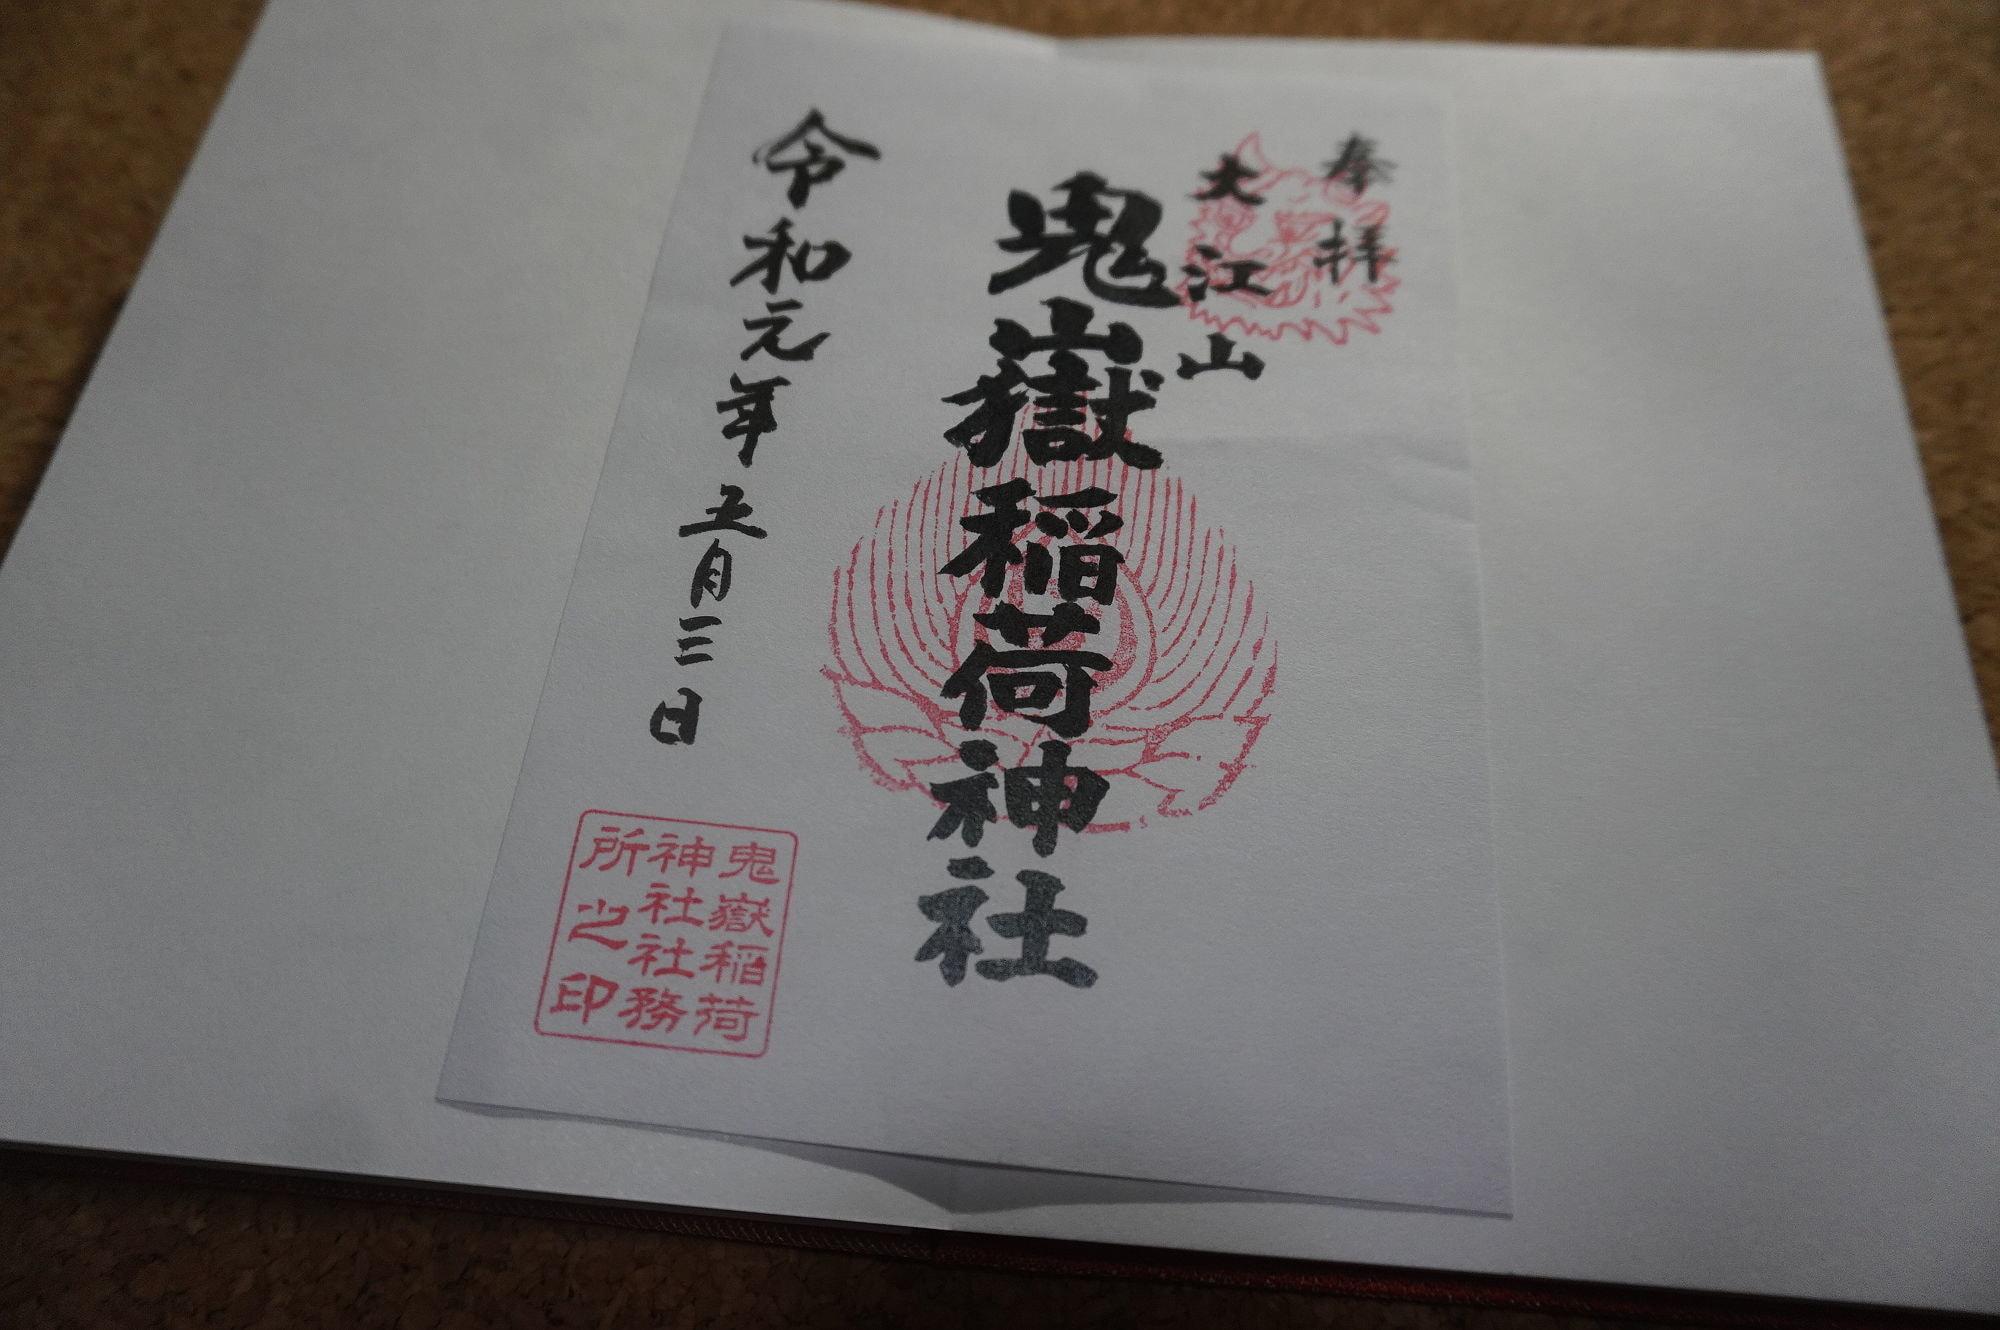 鬼嶽稲荷神社の御朱印